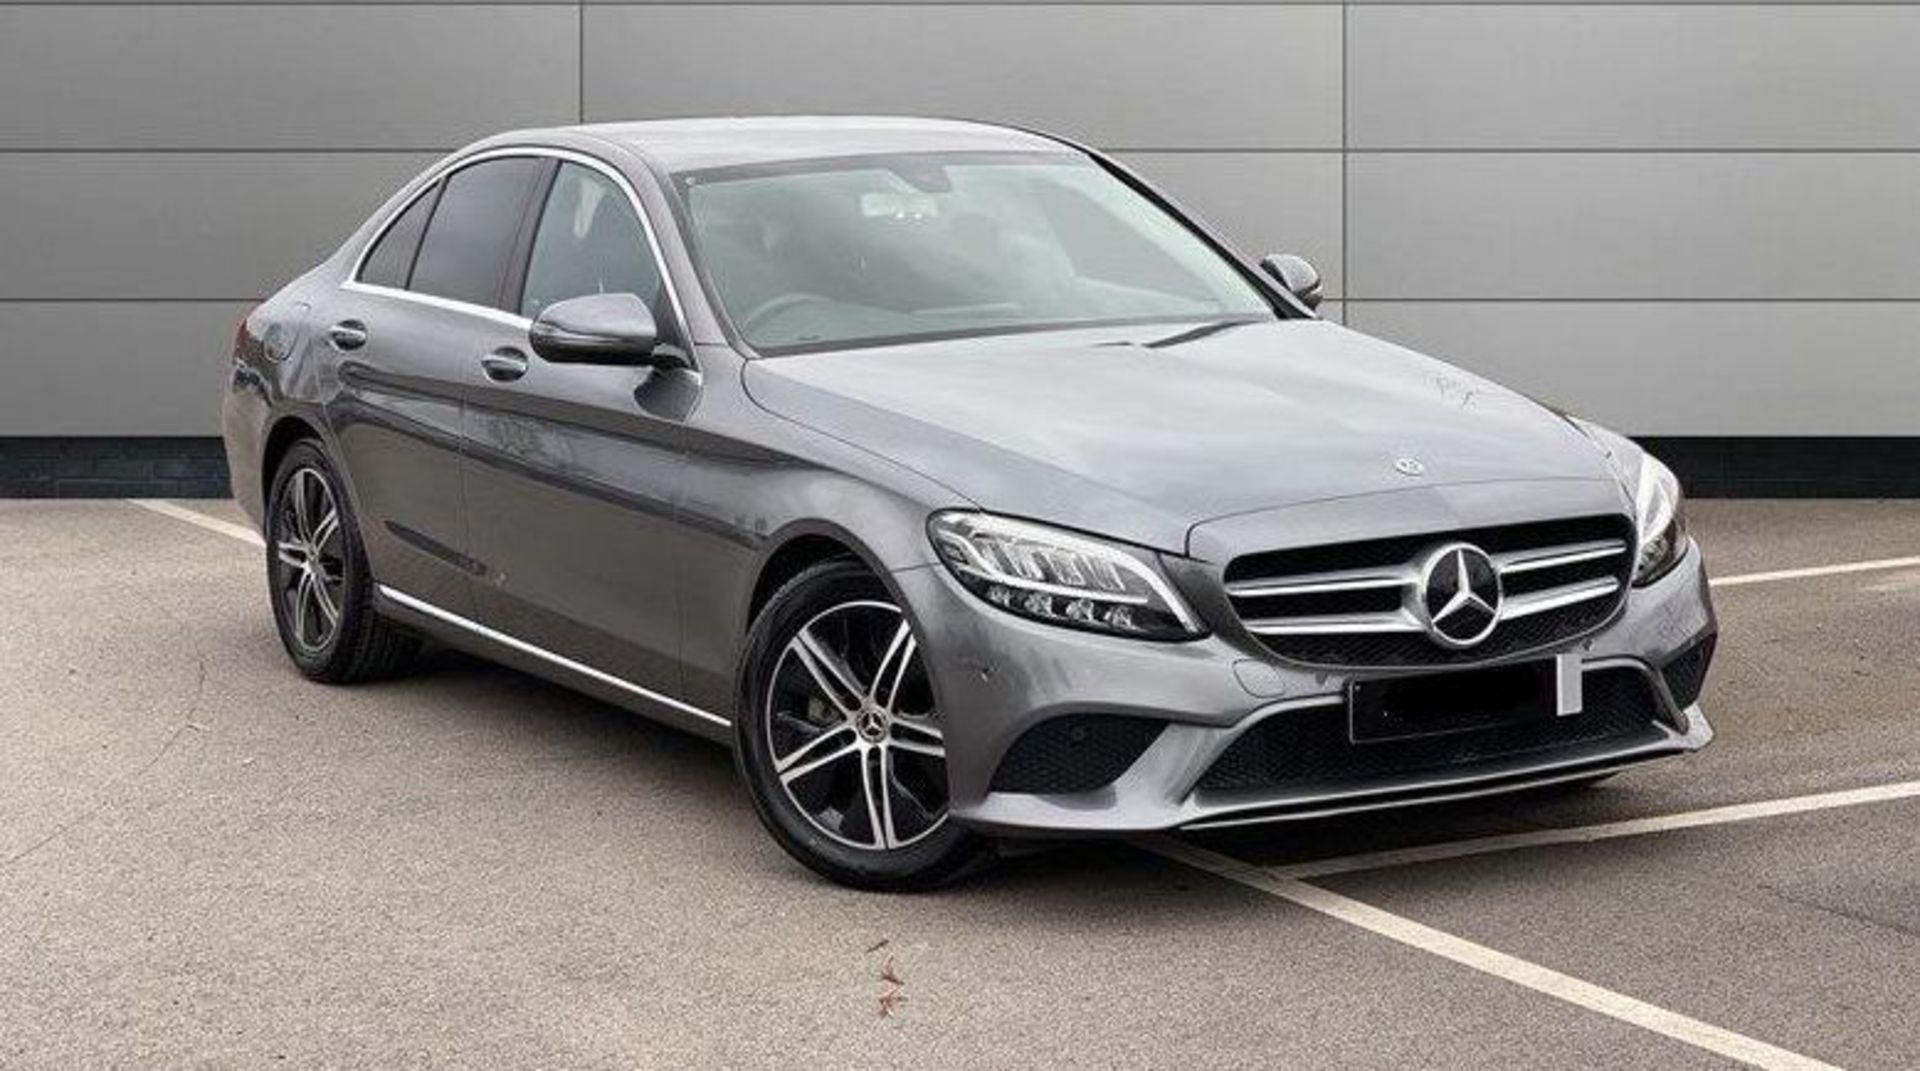 (Reserve Met) Mercedes C220d Sport - 9G Tronic Auto - 188BHP - 2019 Reg - Reversing Cam - Sat Nav -